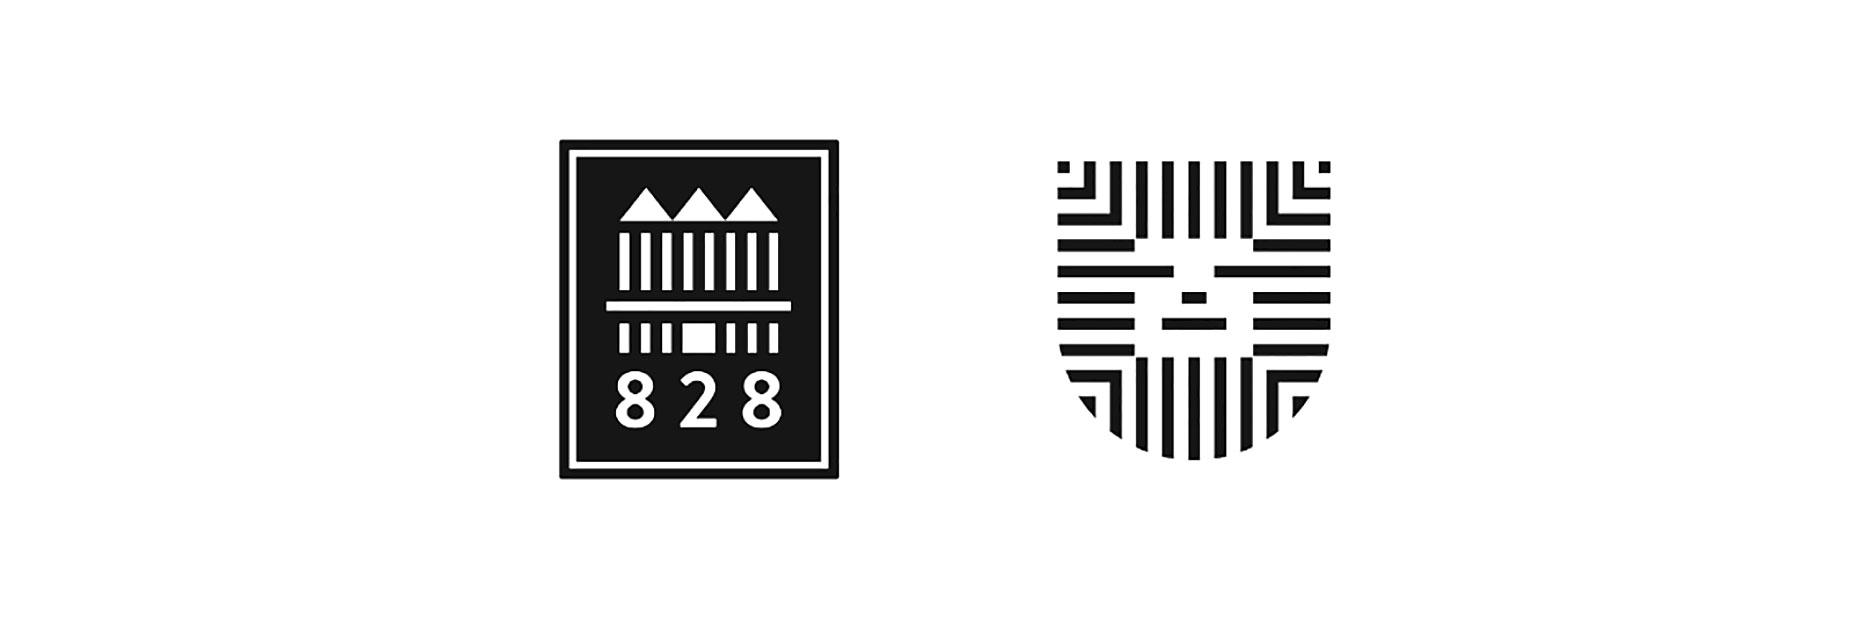 logo-barras